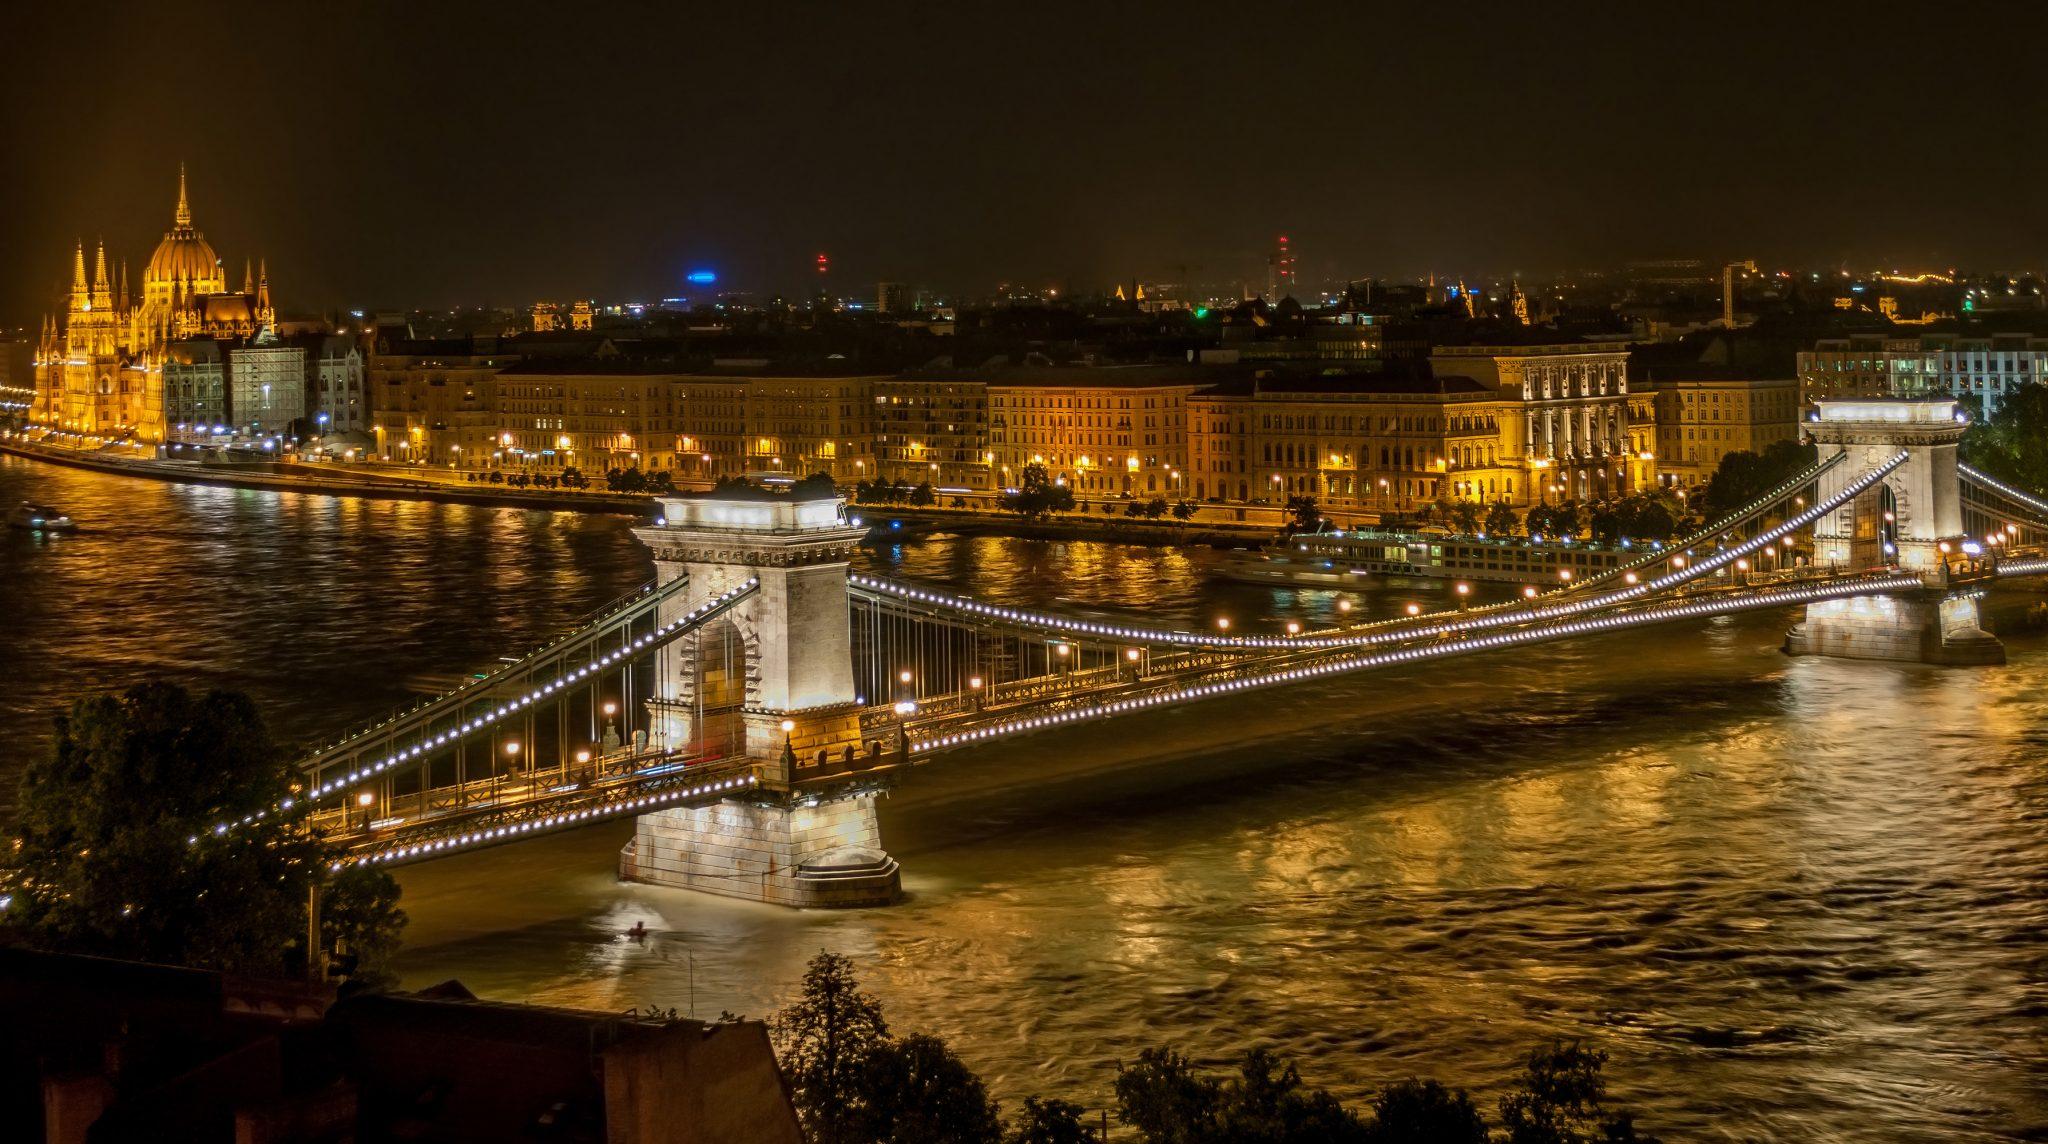 95.Széchenyi_Chain_Bridge_in_Budapest_at_night